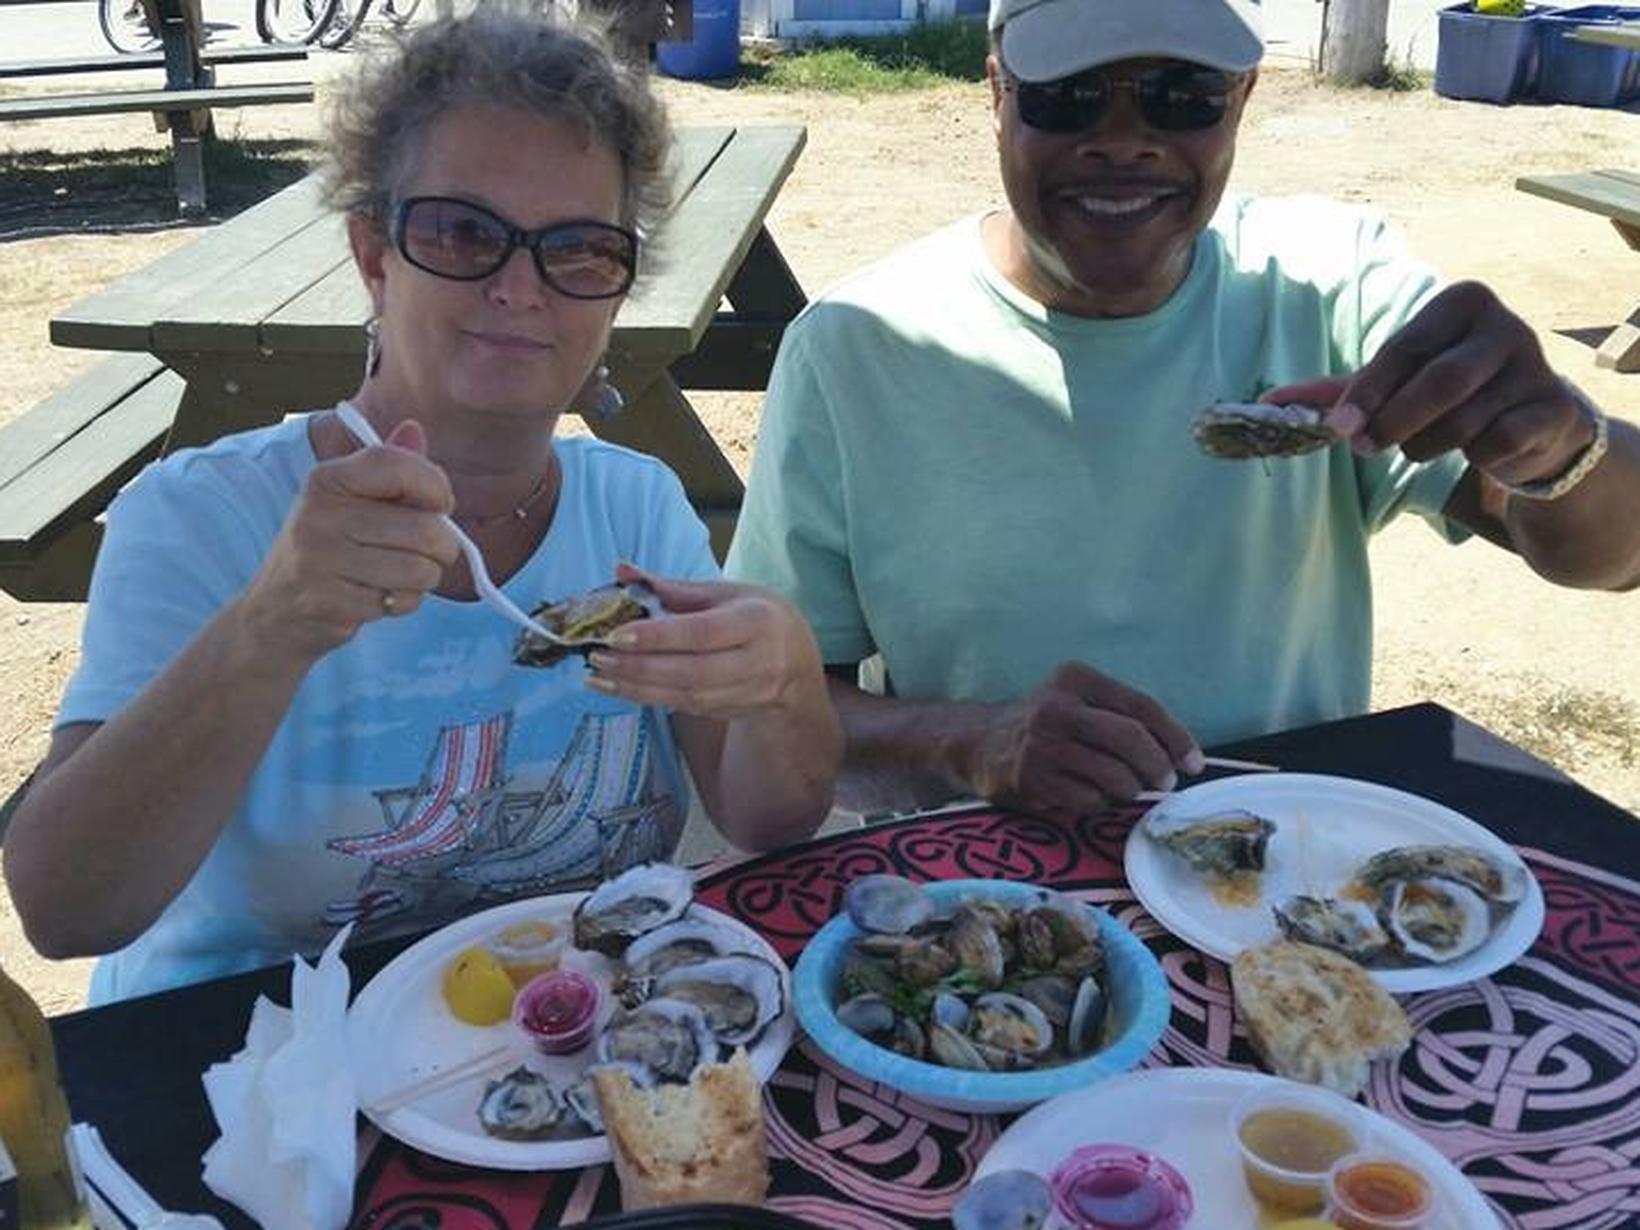 Brenda & Matthew from Santa Clarita, California, United States